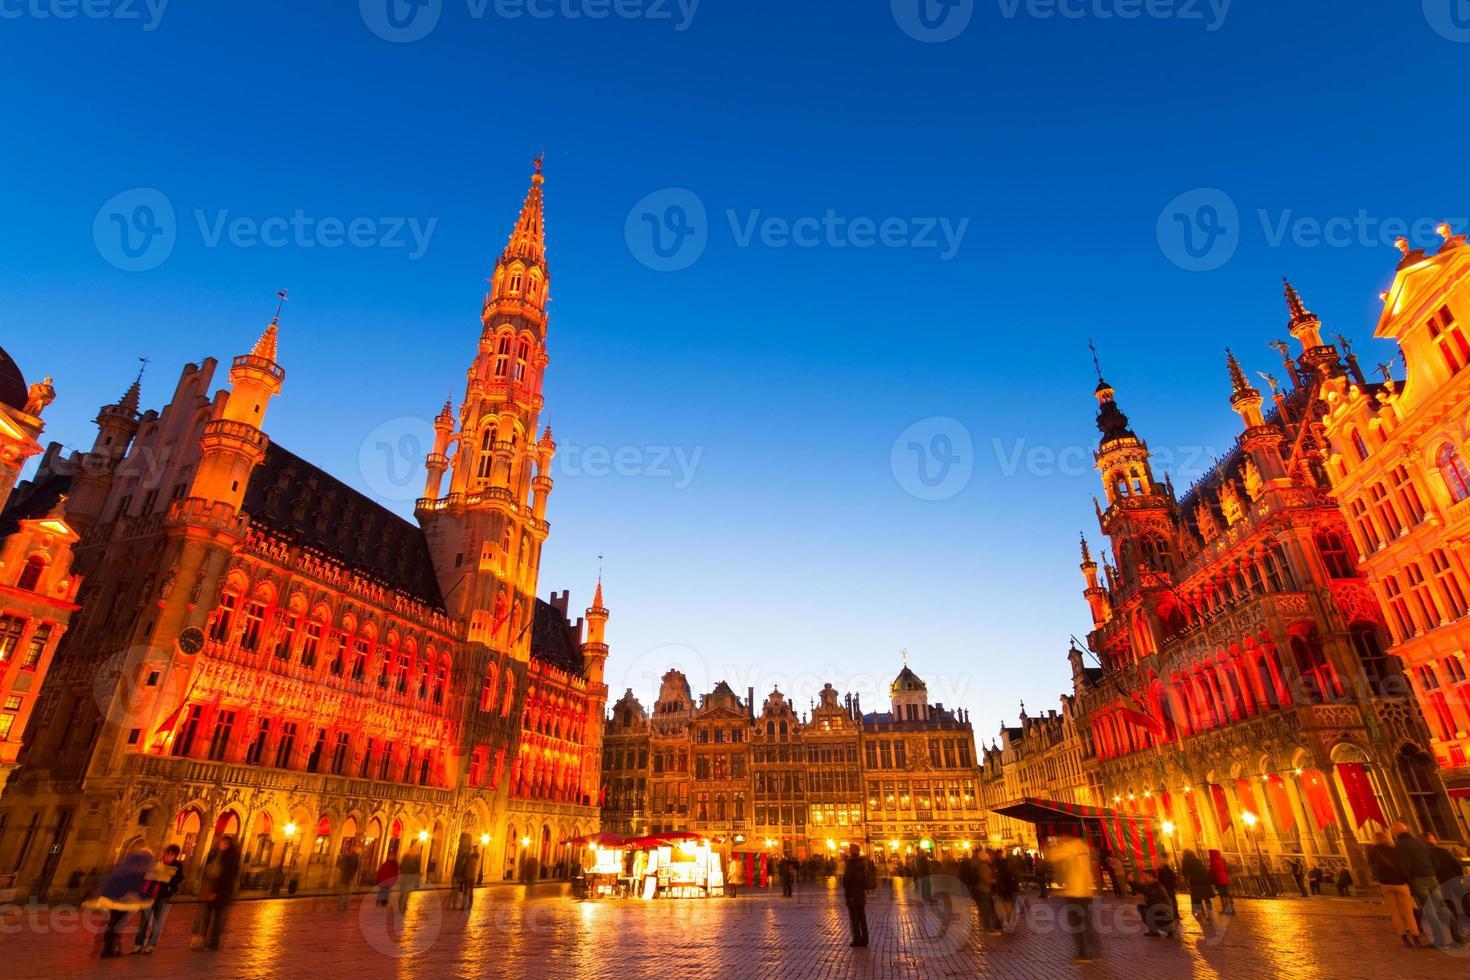 grote markt, brussel, belgië, europa. foto